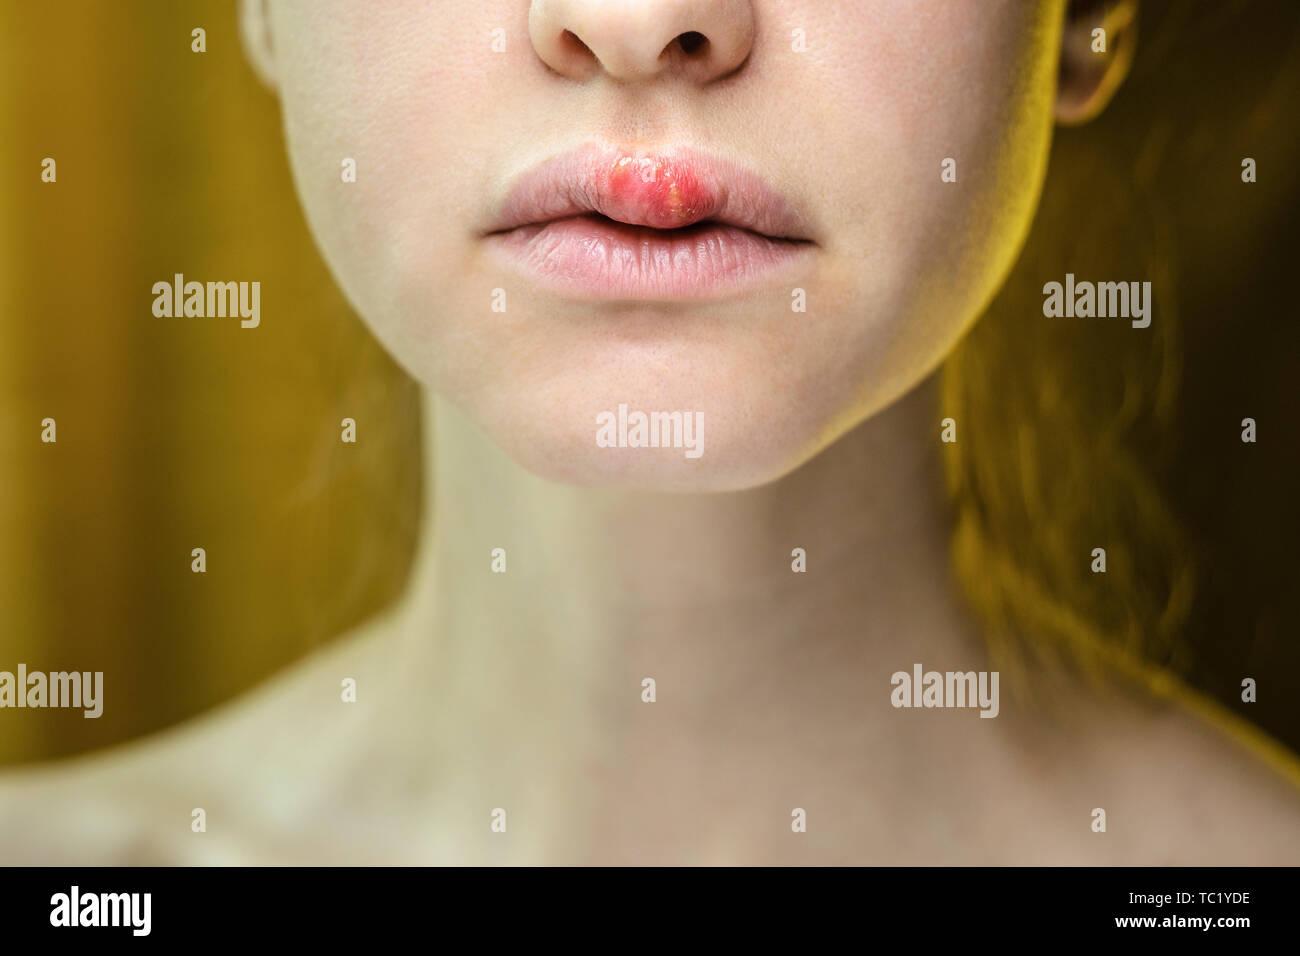 Upper Lip Stock Photos & Upper Lip Stock Images - Alamy